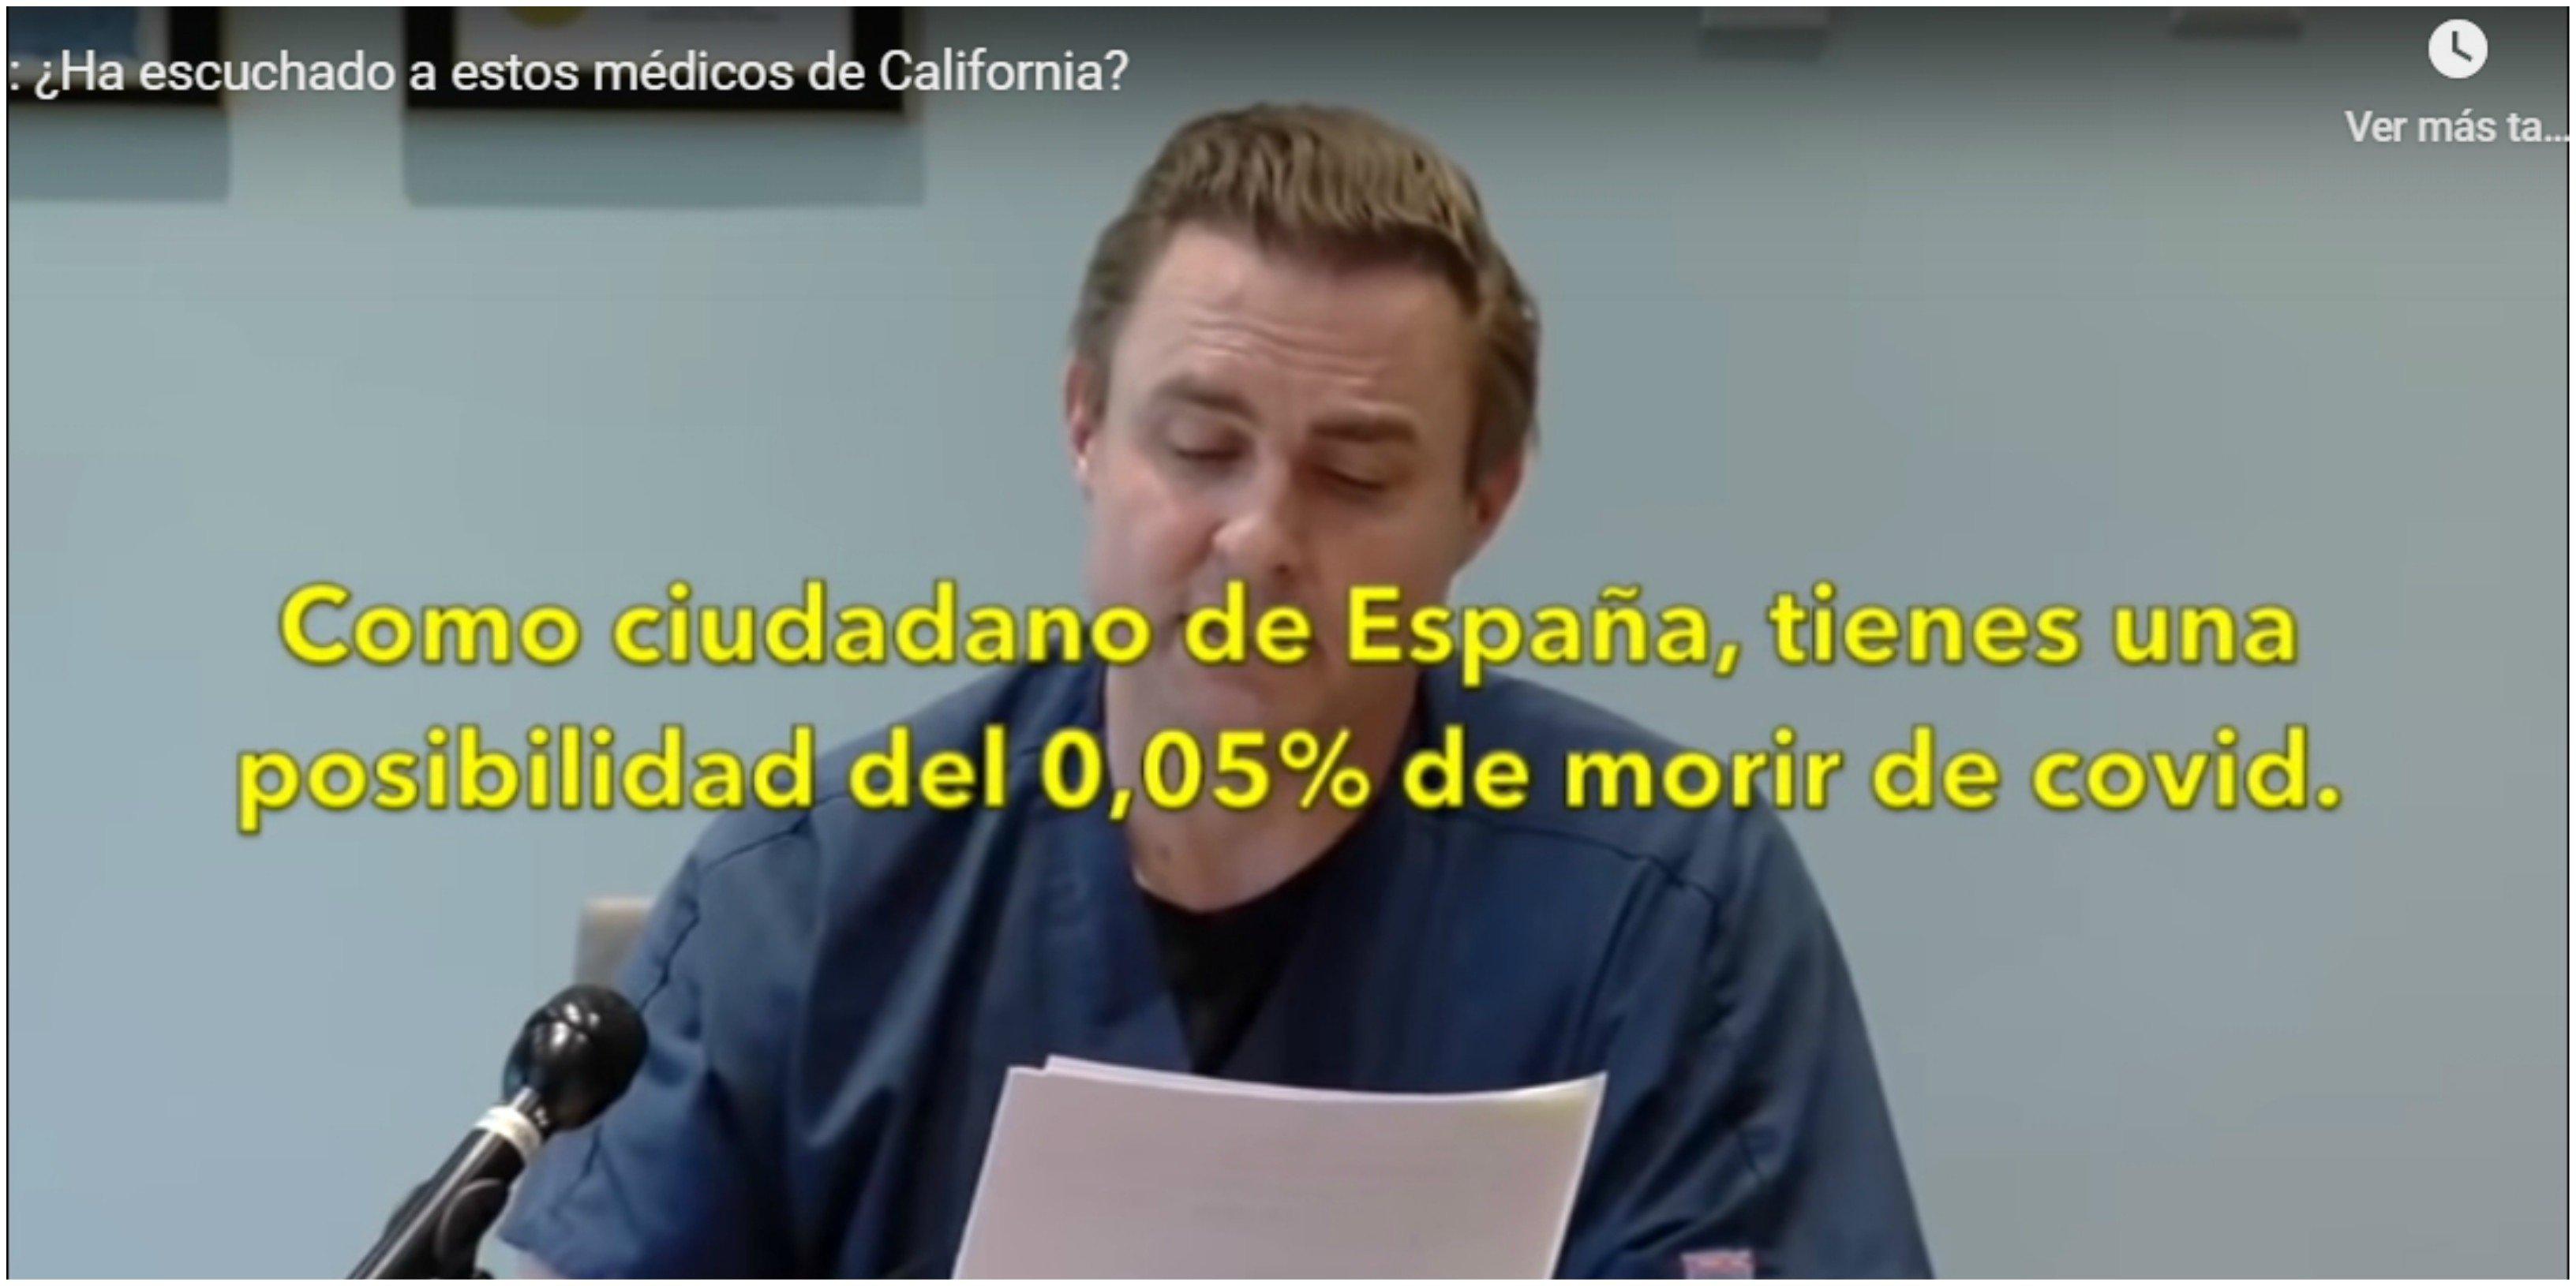 No se pierdan a estos médicos californianos